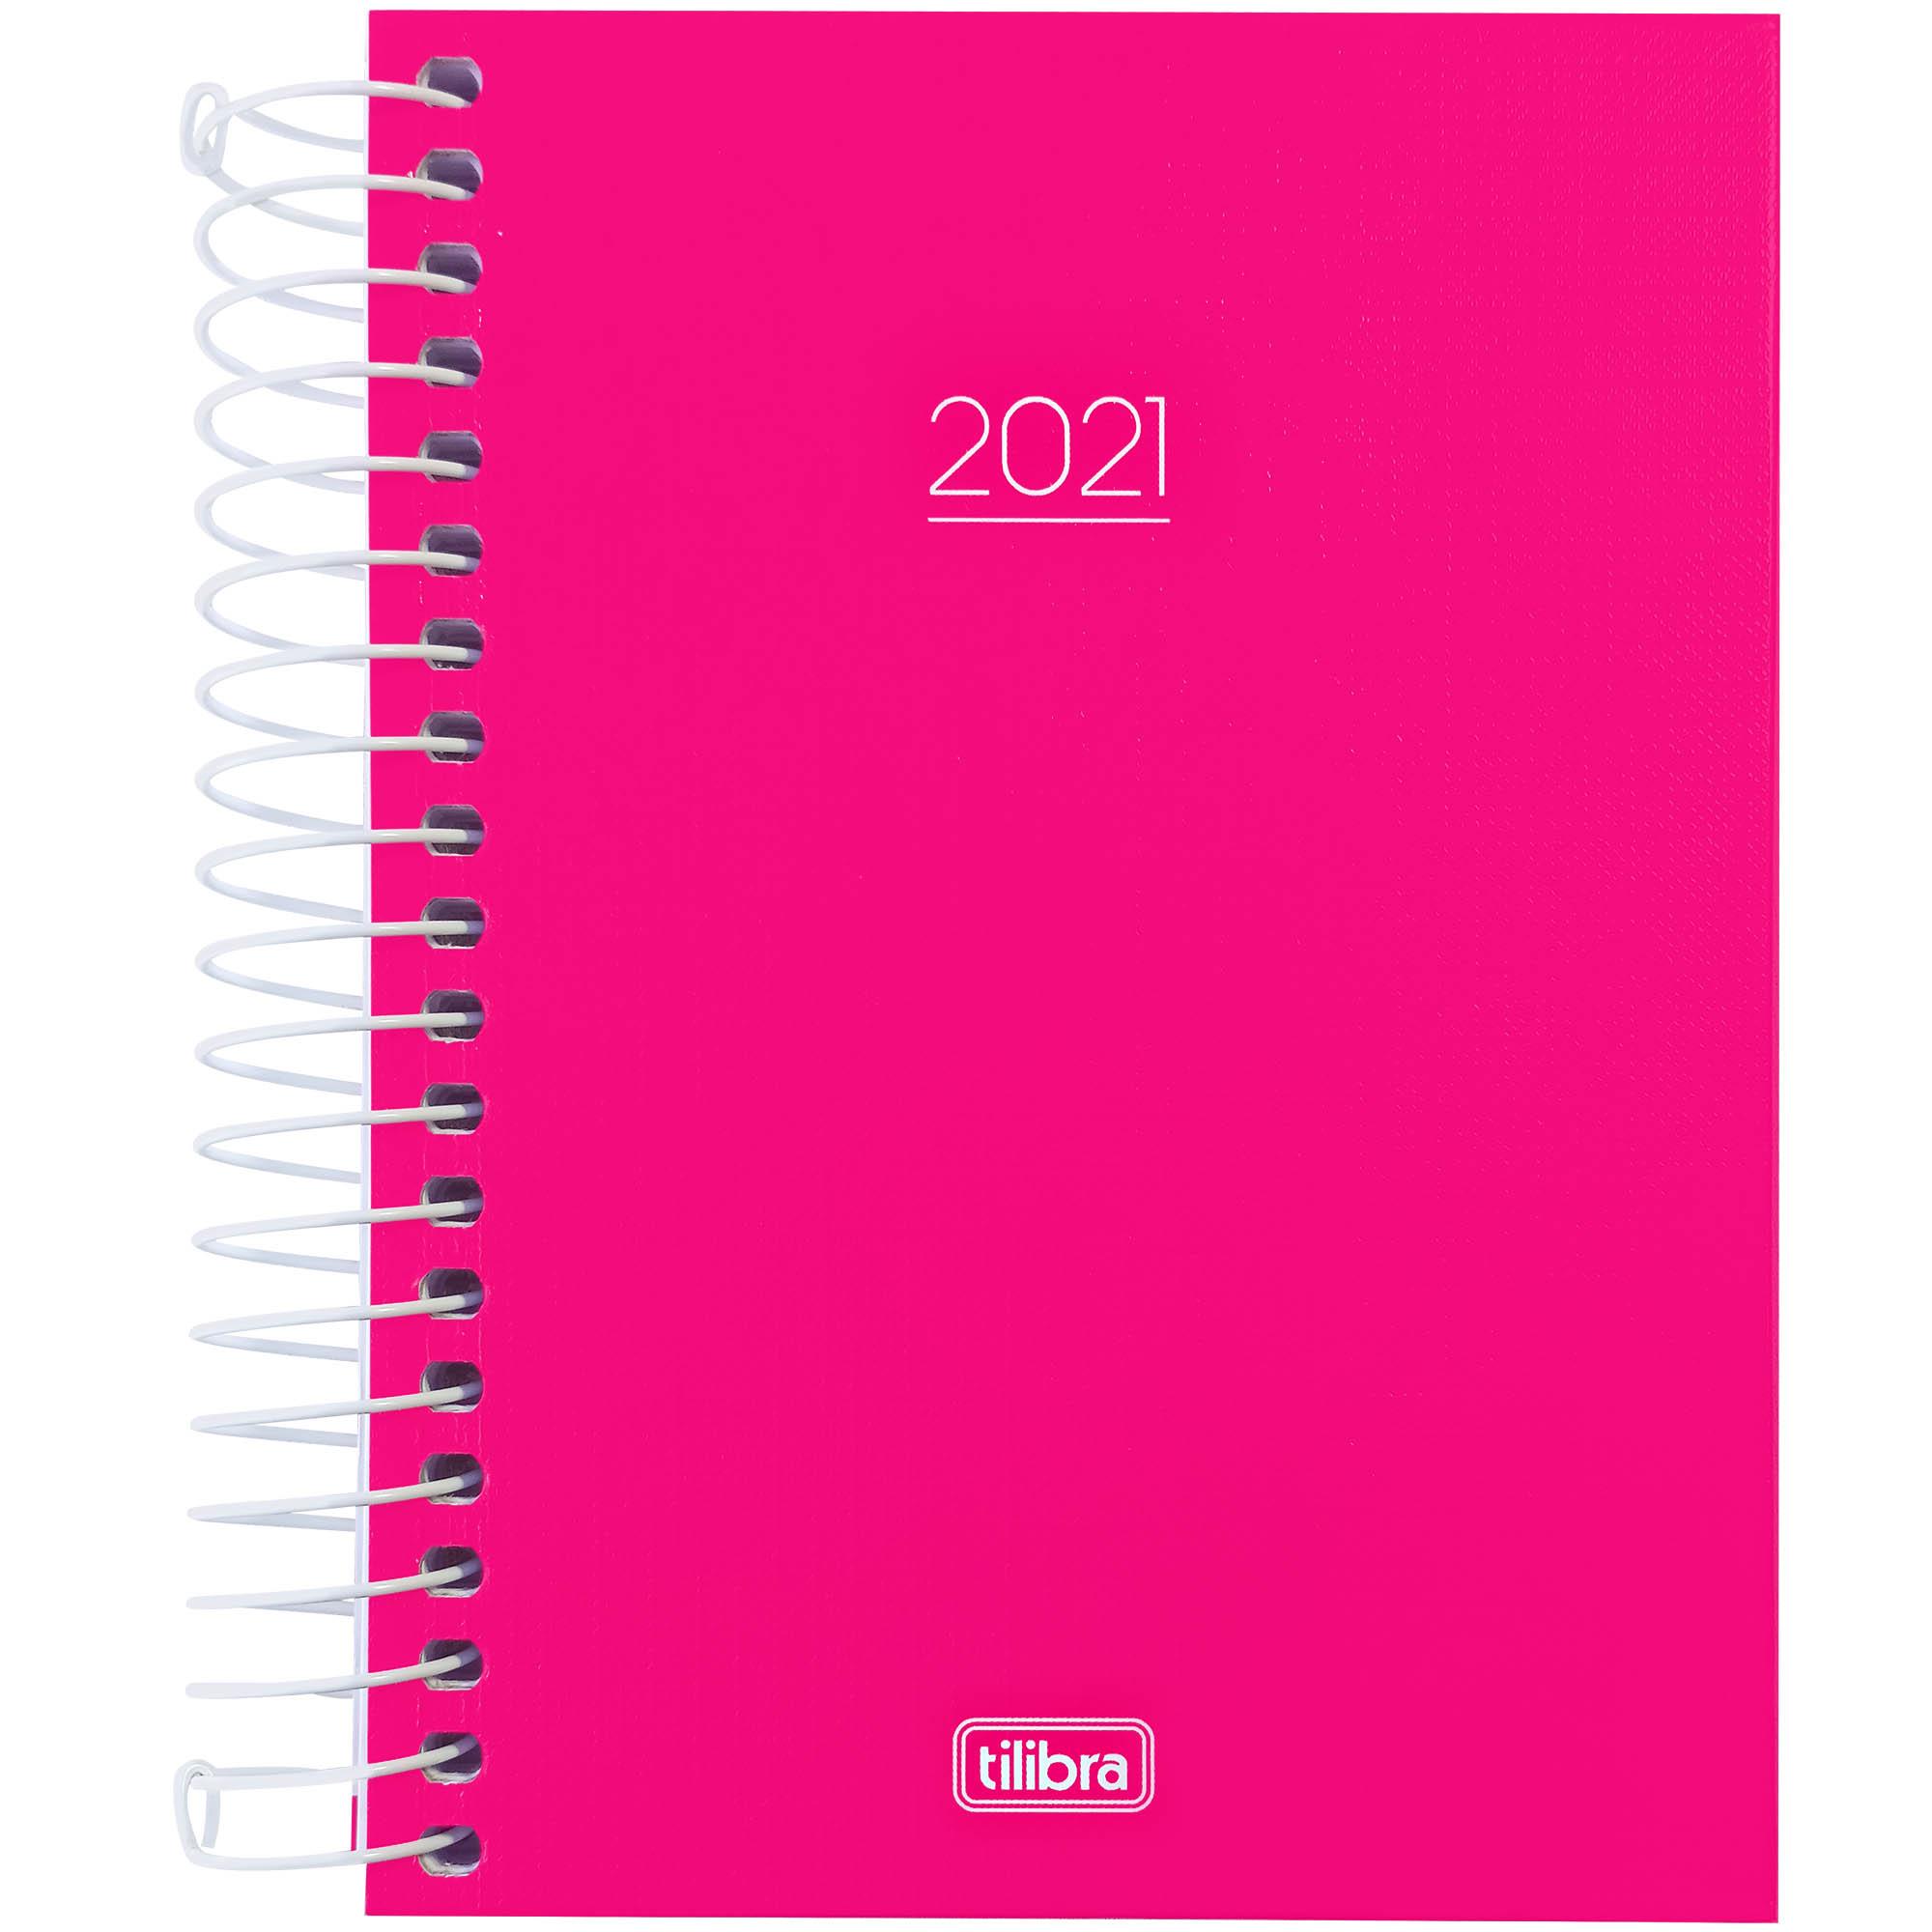 Agenda Pepper 2021 Espiral Cor Rosa CD 160f 29.109 - Tilibra